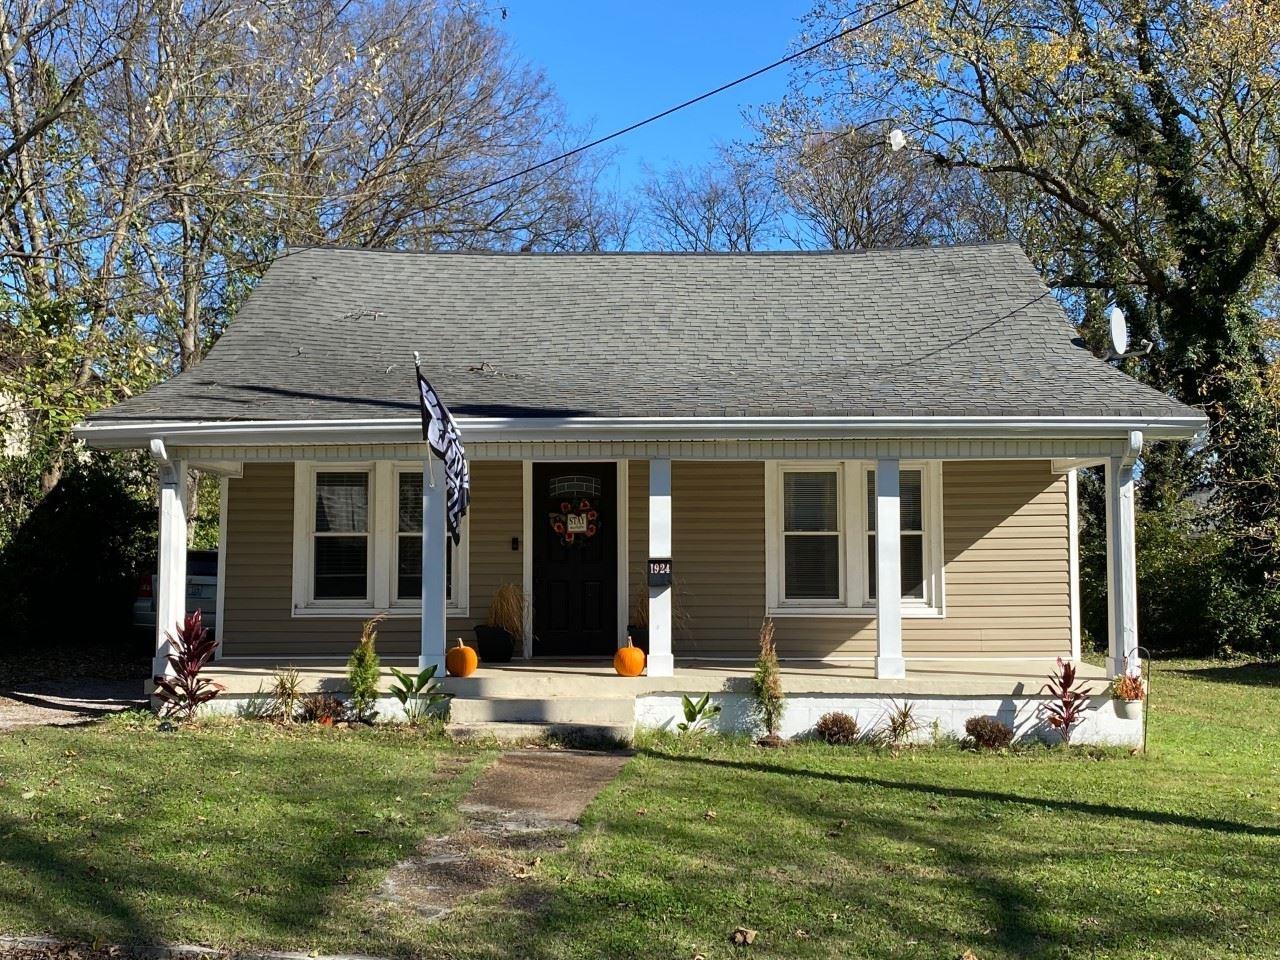 1924 16th Ave N, Nashville, TN 37208 - MLS#: 2207373